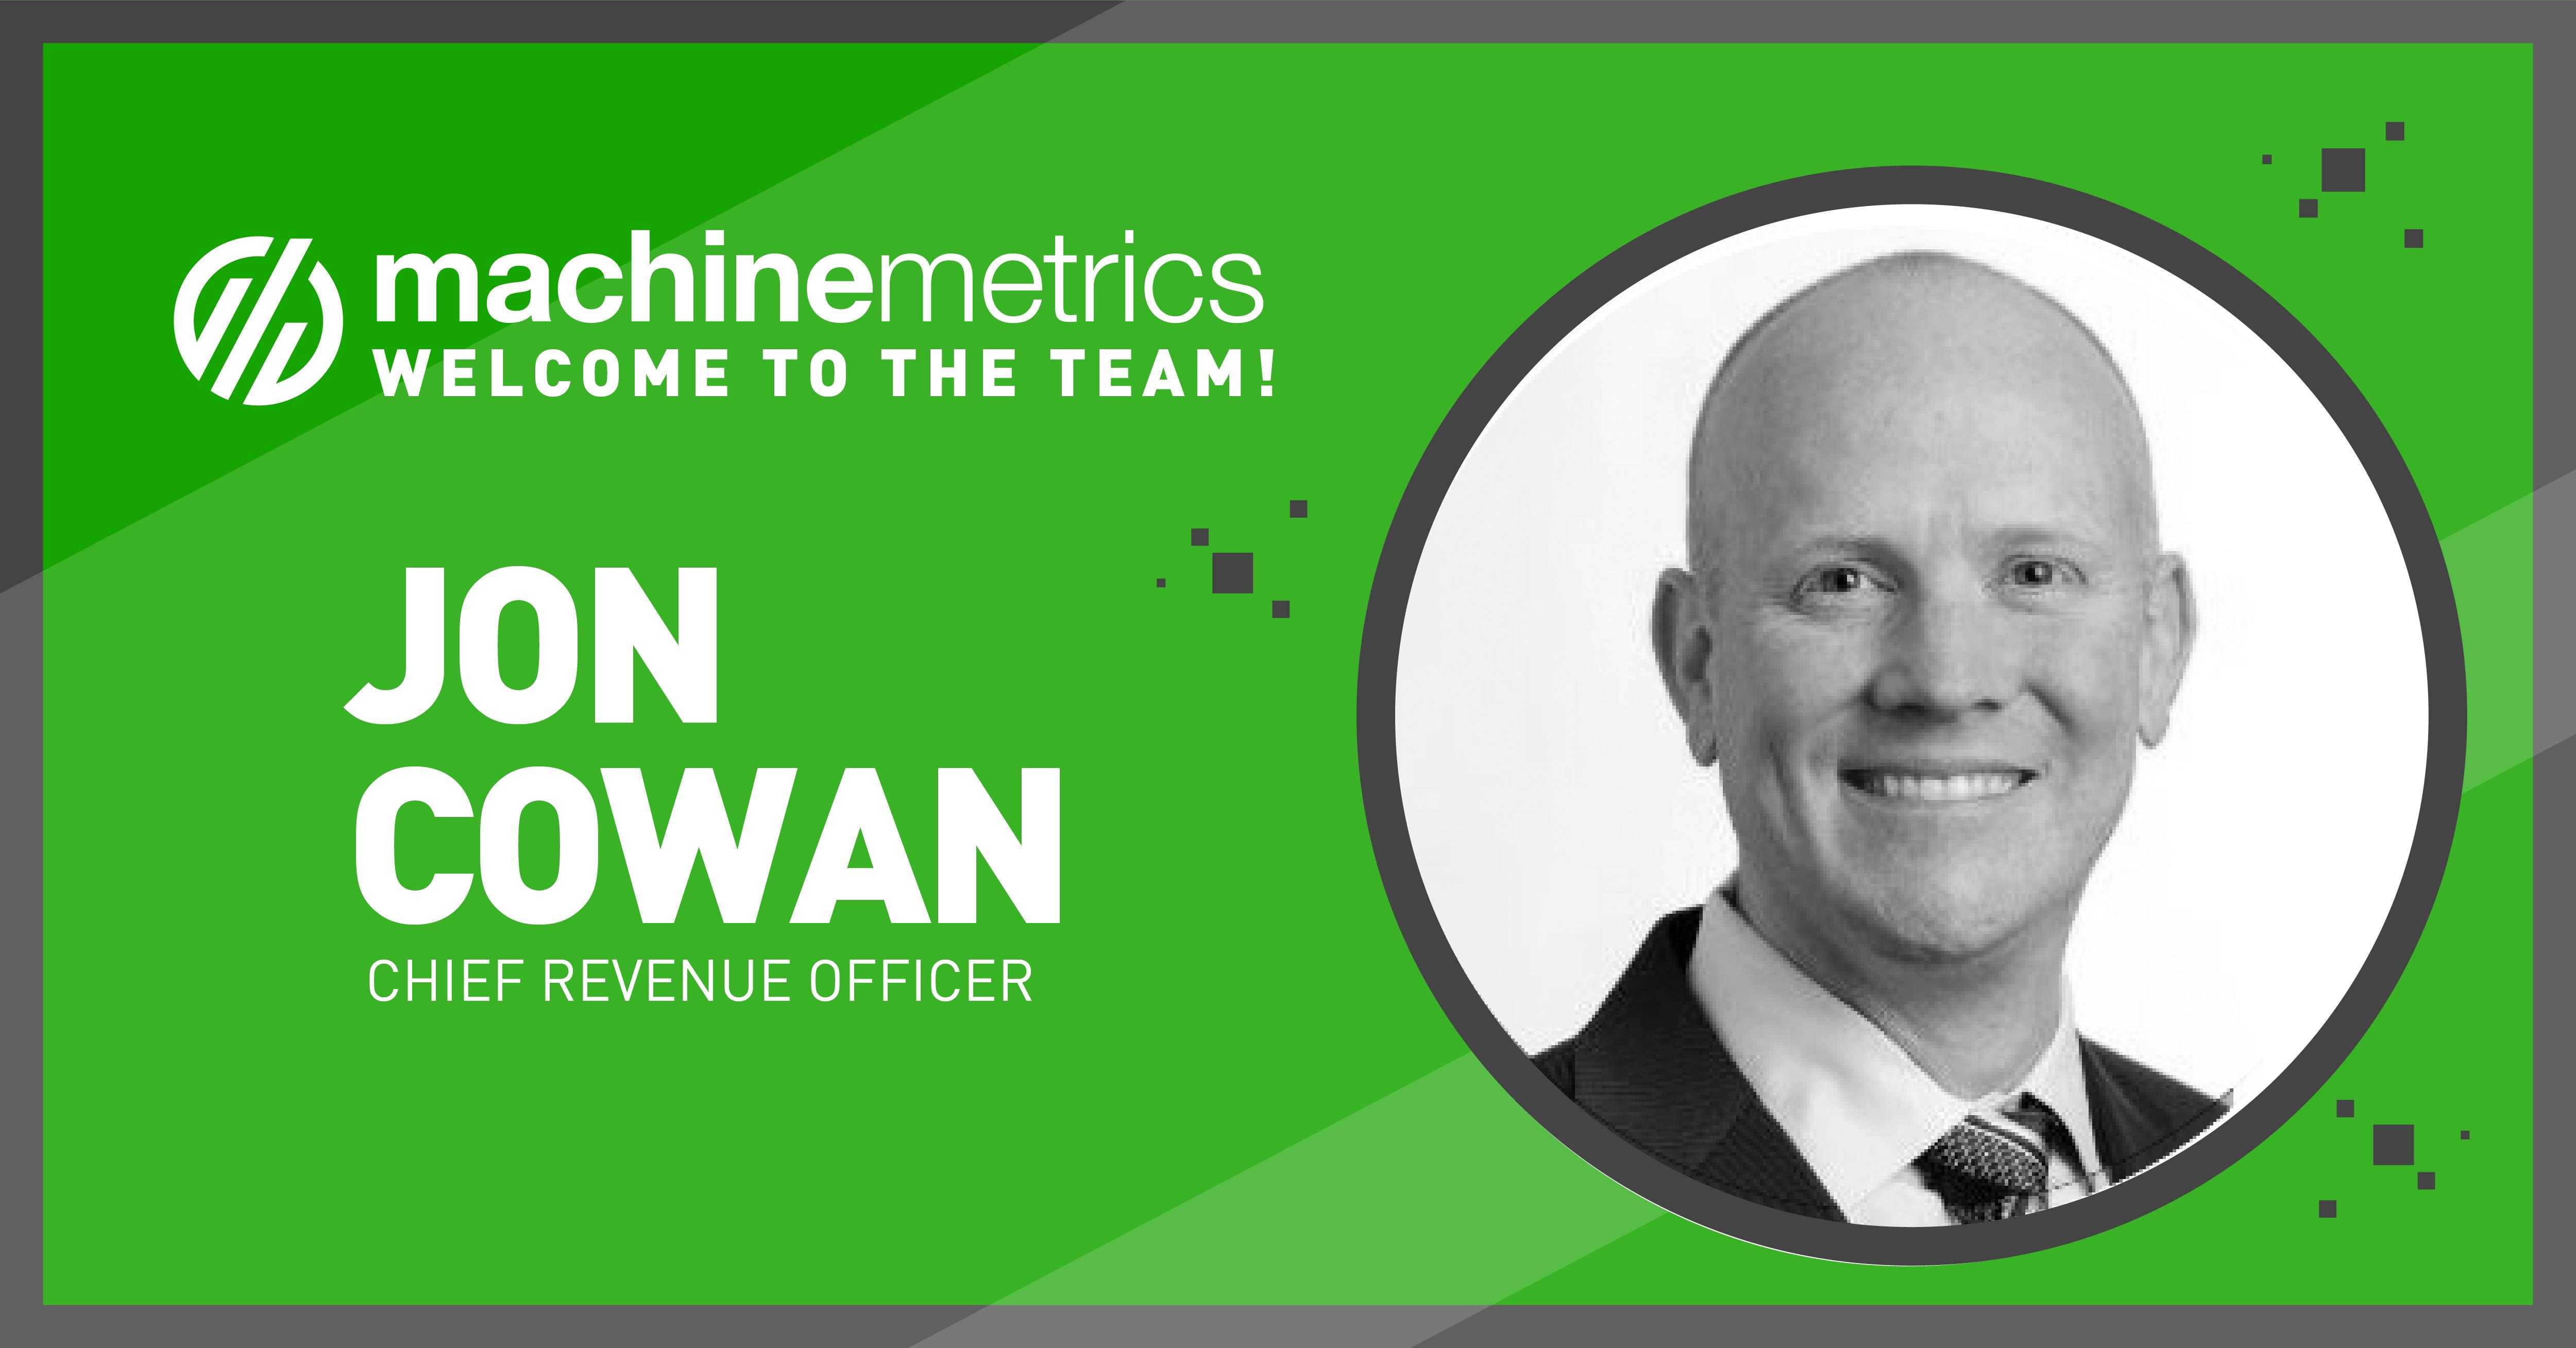 MachineMetrics Appoints Jon Cowan as Chief Revenue Officer